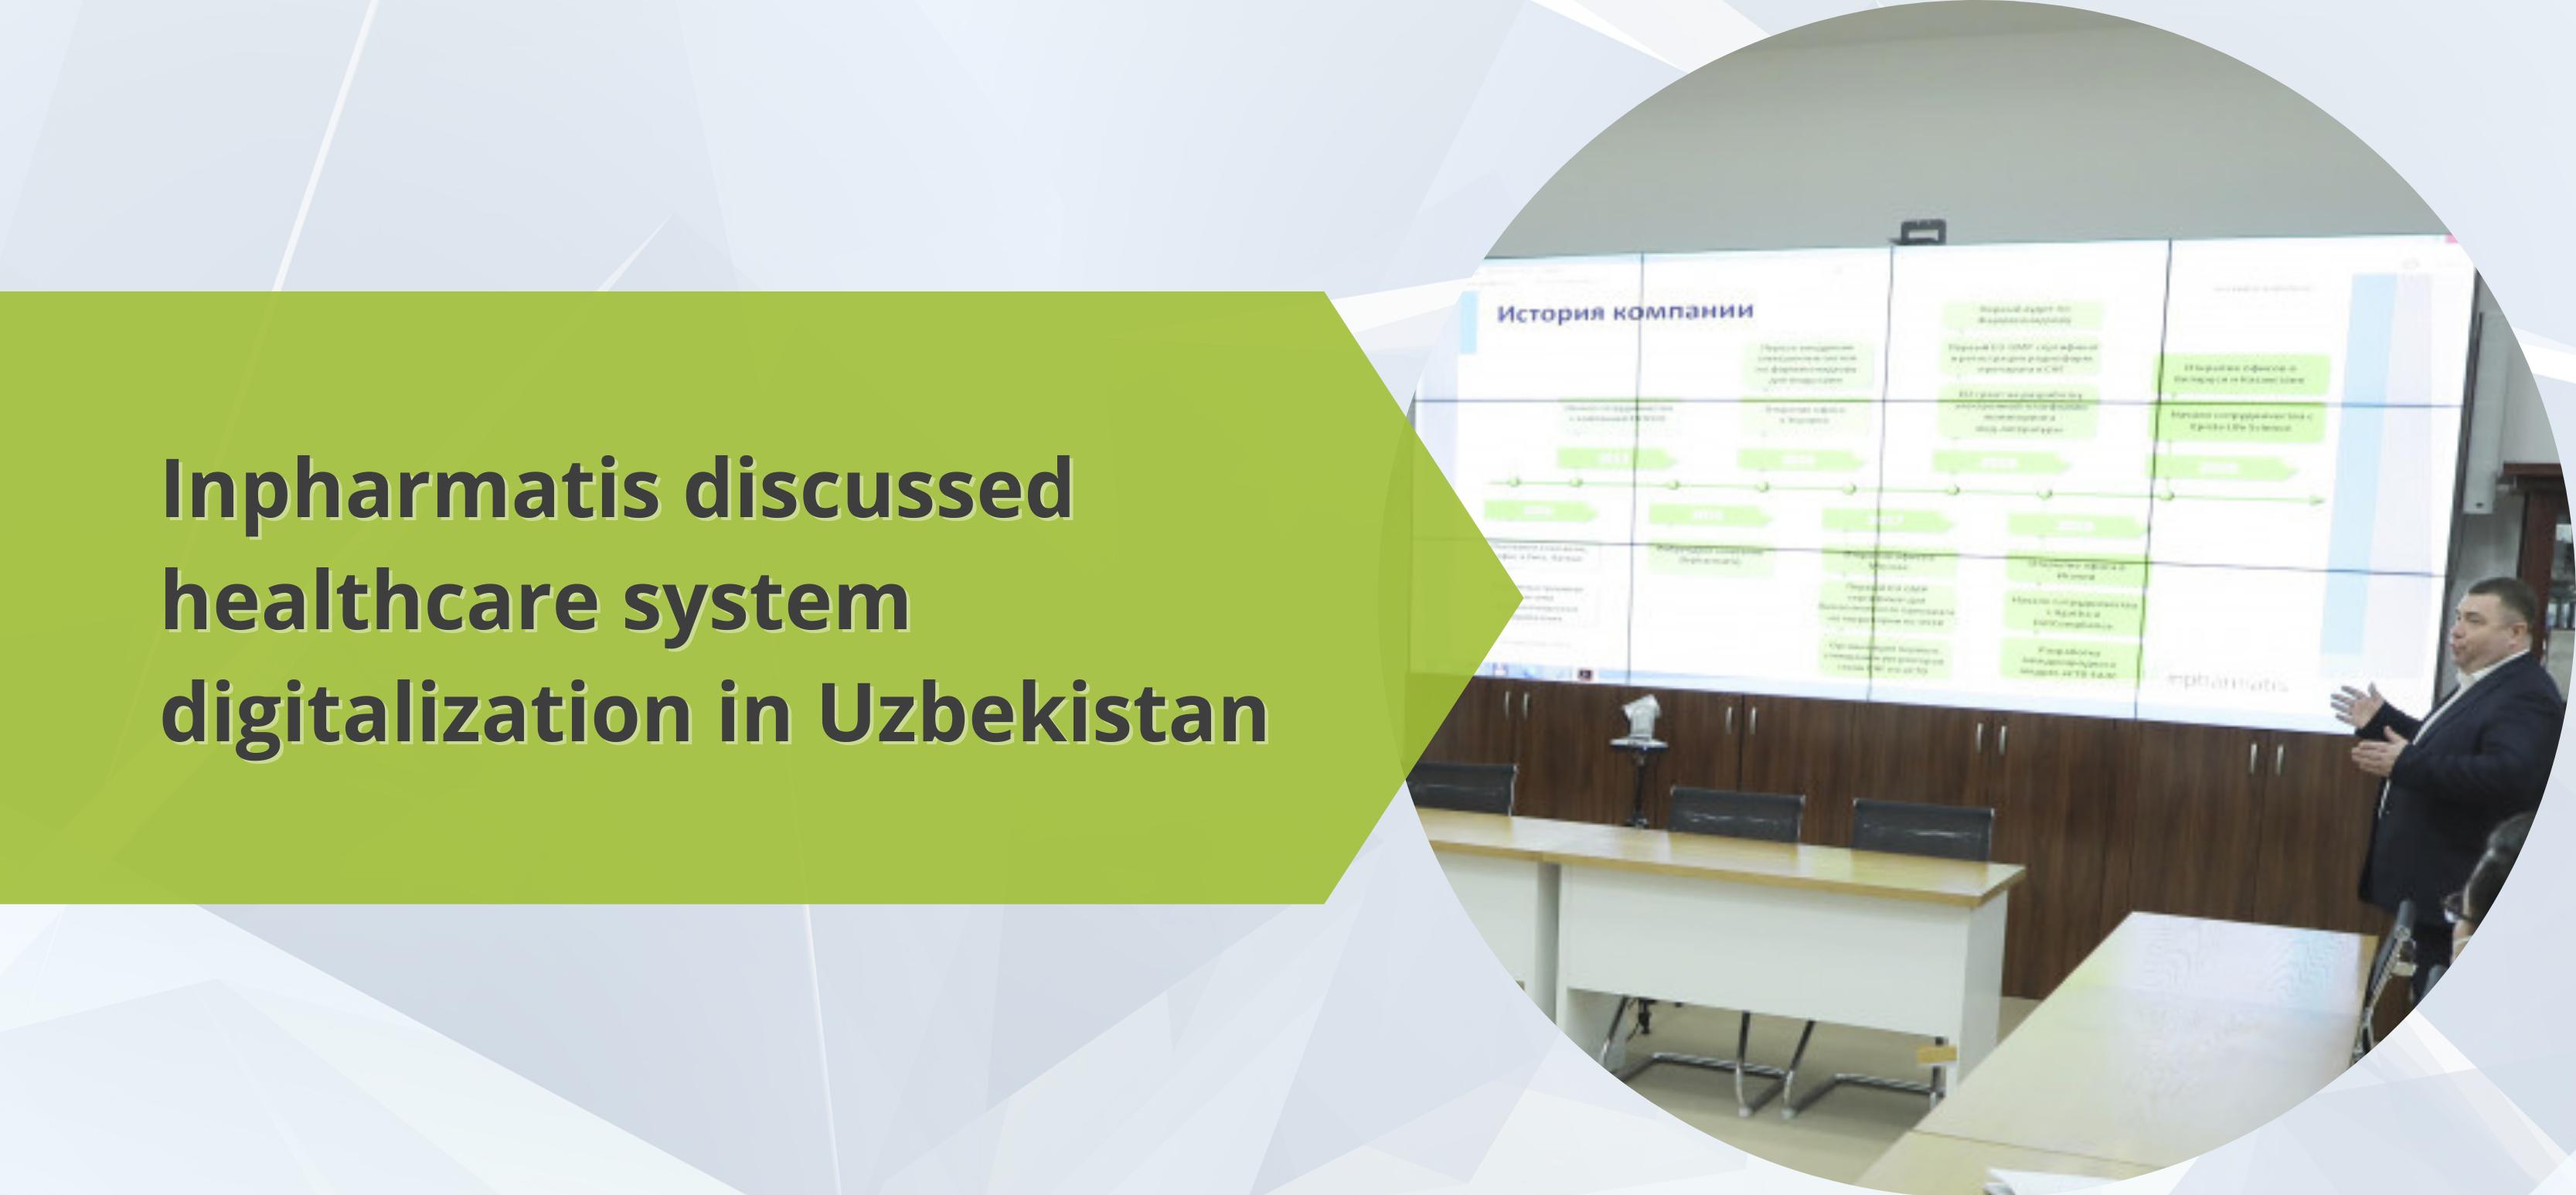 Inpharmatis обсудил Цифровизацию системы здравоохранения Узбекистана